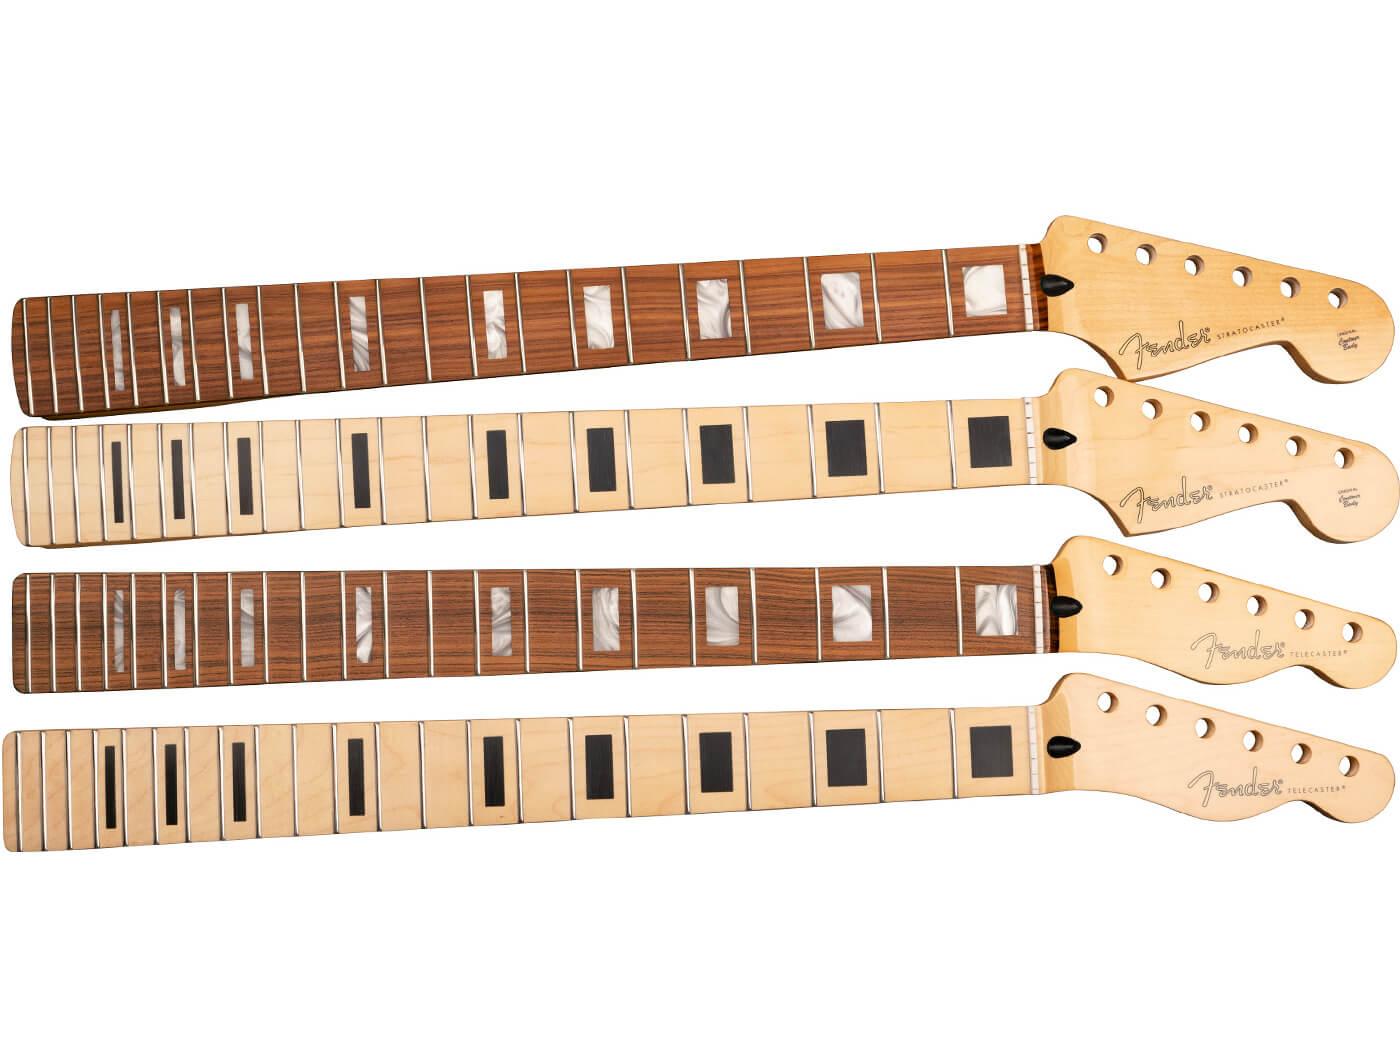 Fender Player Series Necks